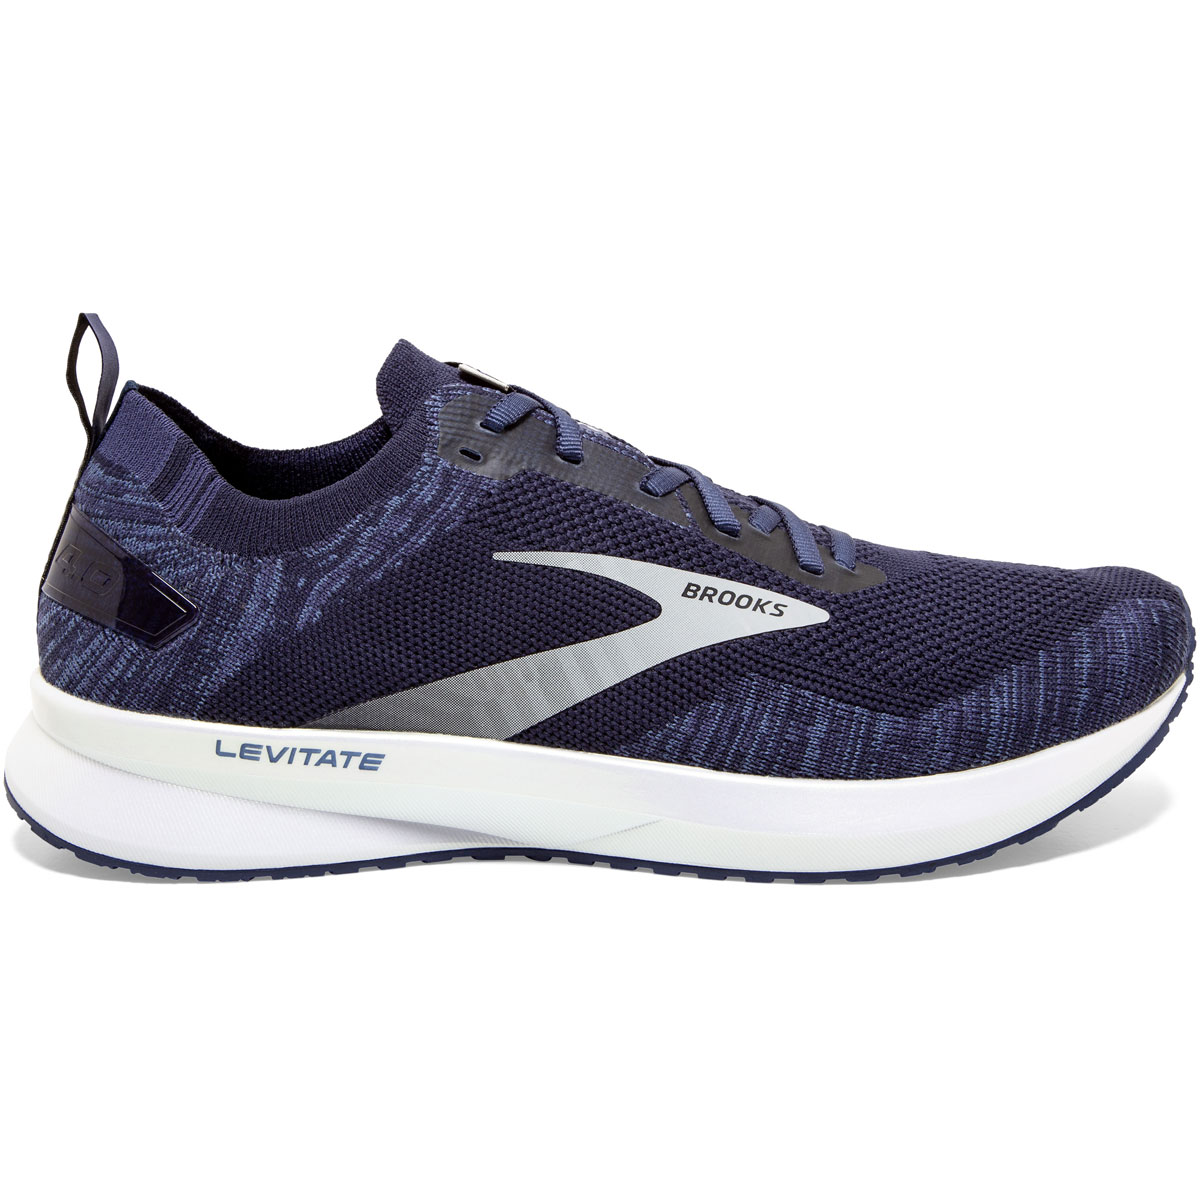 Men's Brooks Levitate 4 Running Shoe - Color: Navy/Grey/White - Size: 7 - Width: Regular, Navy/Grey/White, large, image 1